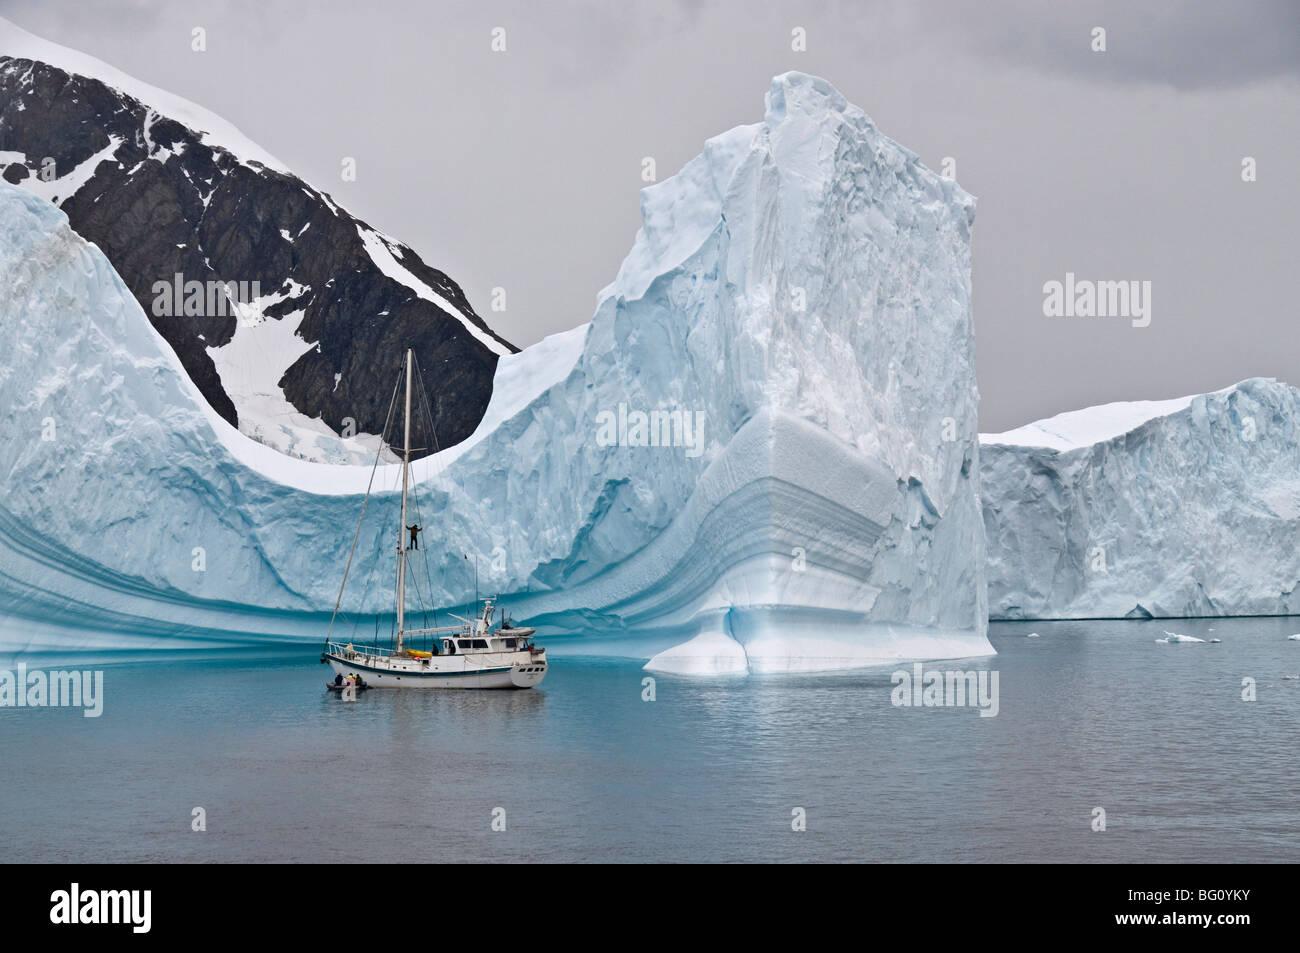 Sailing yacht and iceberg, Errera Channel, Antarctic Peninsula, Antarctica, Polar Regions Stock Photo